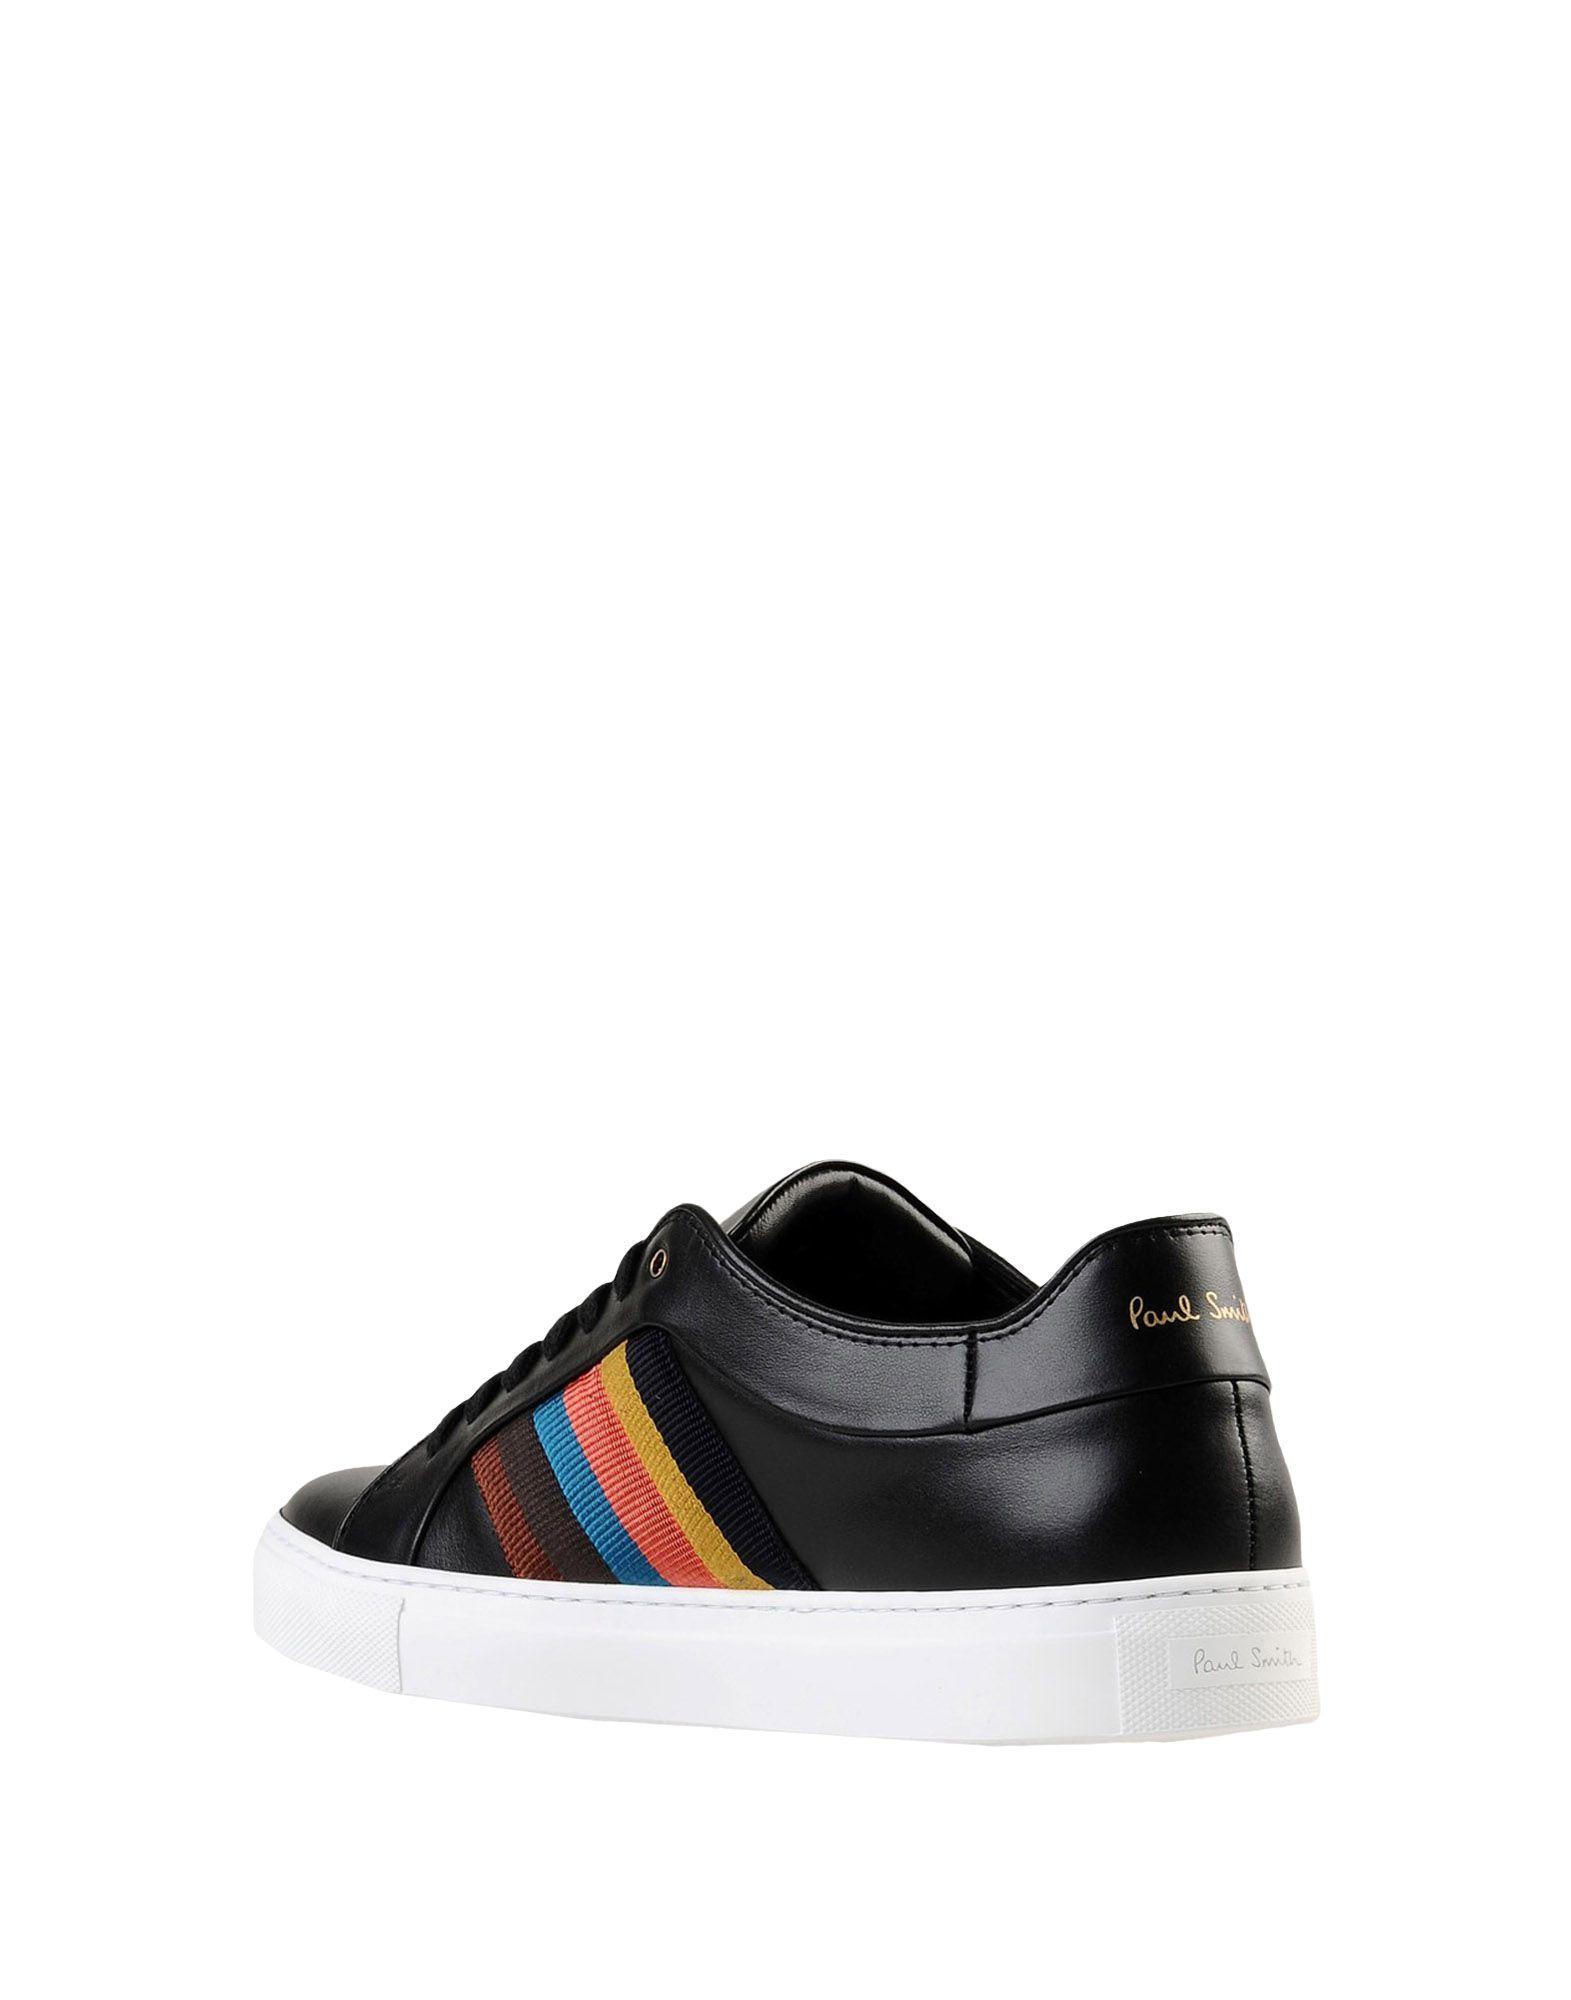 Paul Smith Sneakers Herren beliebte  11538535NC Gute Qualität beliebte Herren Schuhe e1ef2a